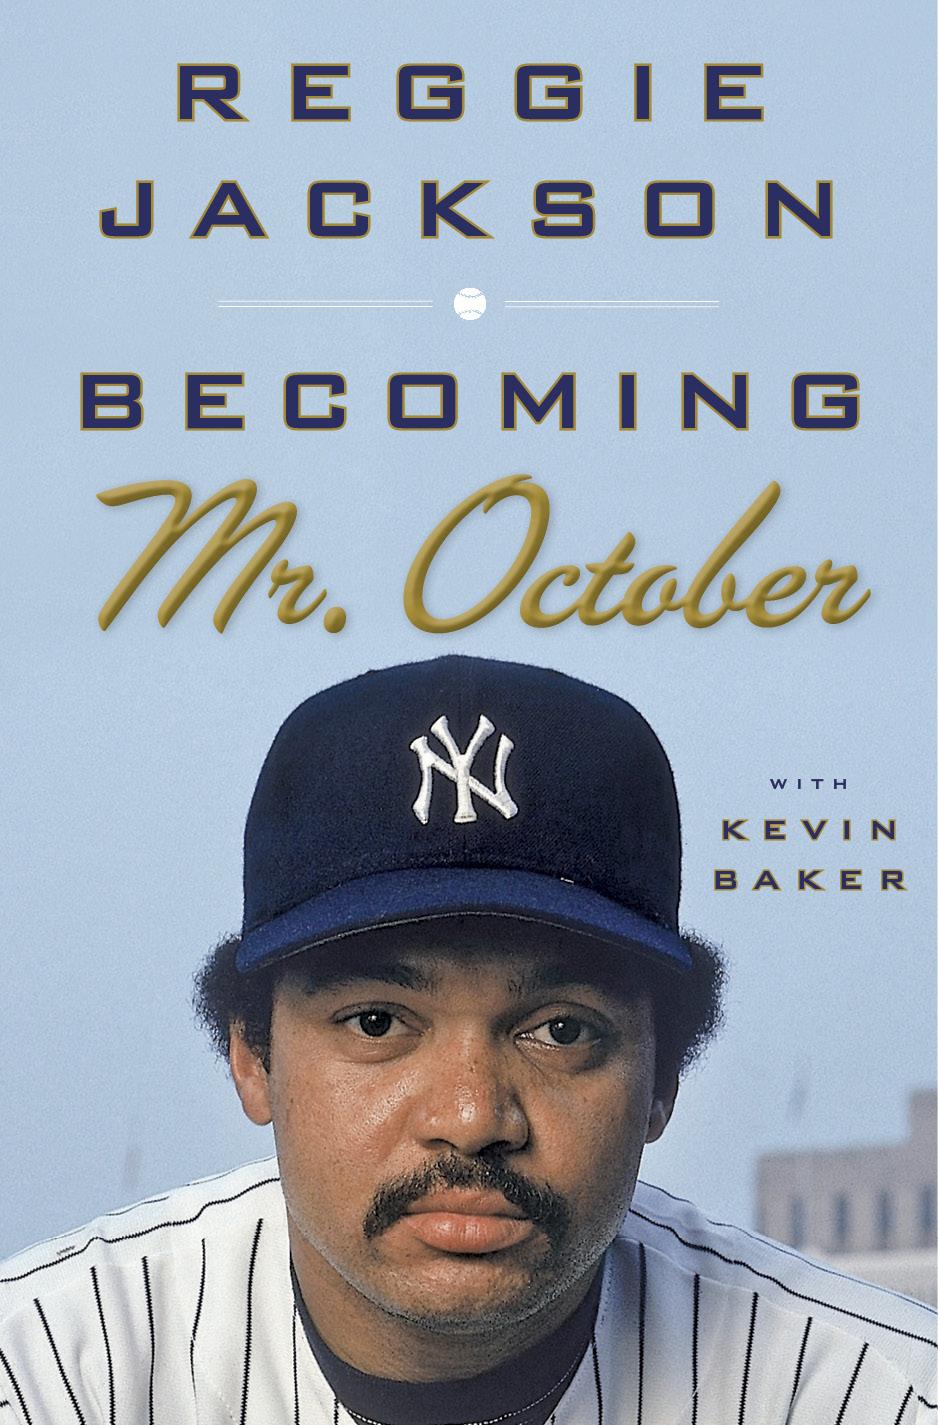 Reggie Jackson: Becoming Mr. October